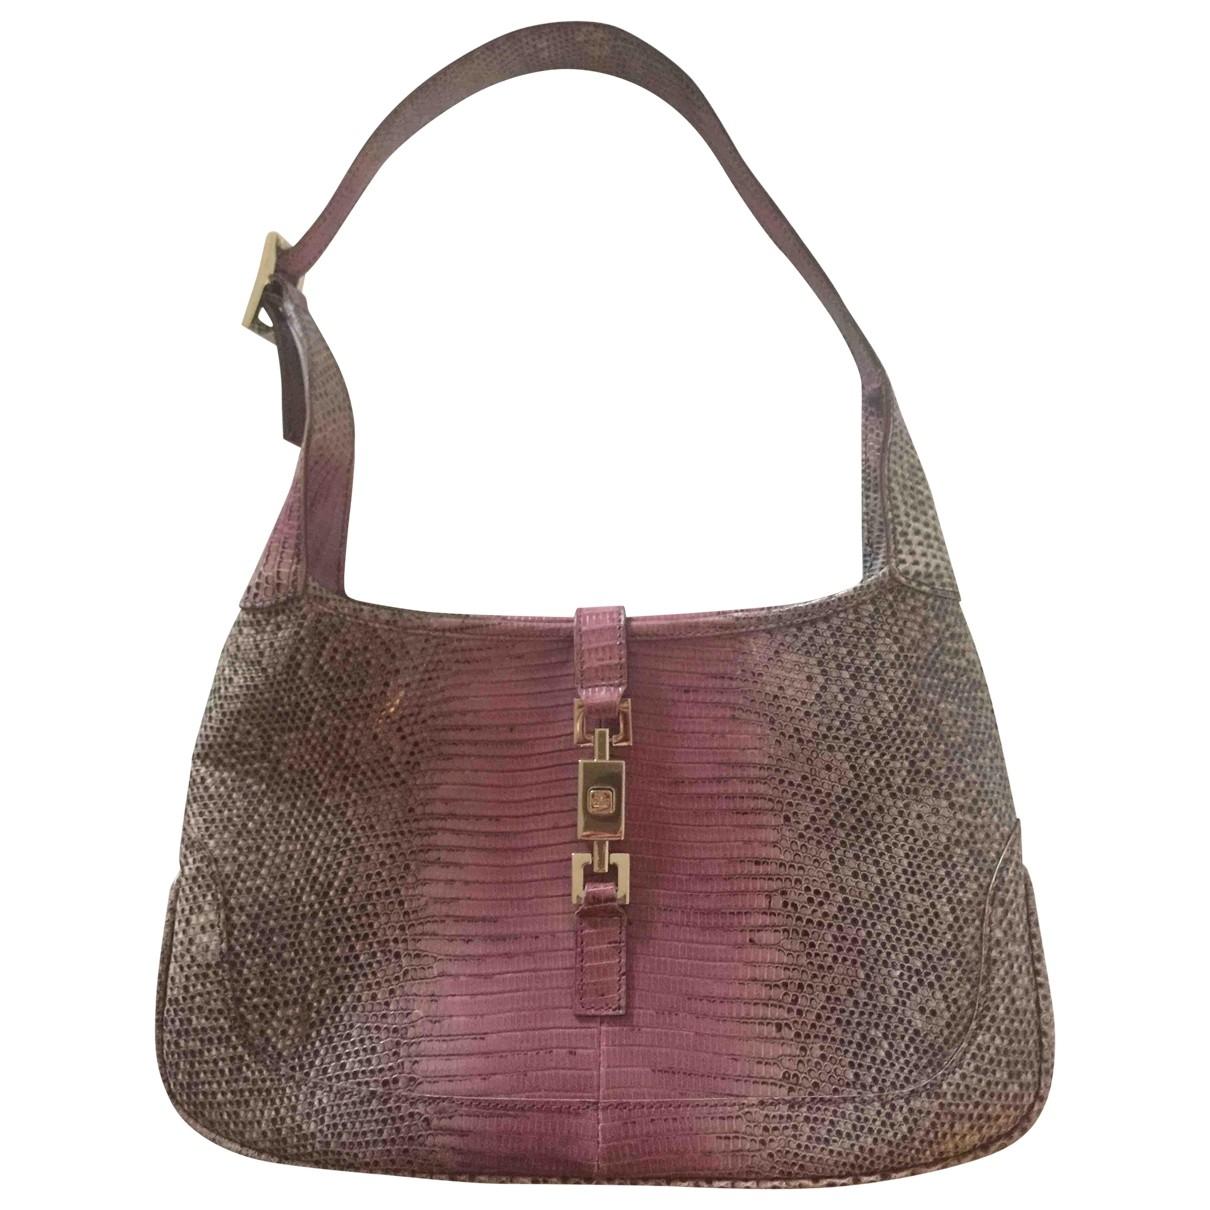 Gucci Jackie Vintage  Handtasche in  Rosa Echse